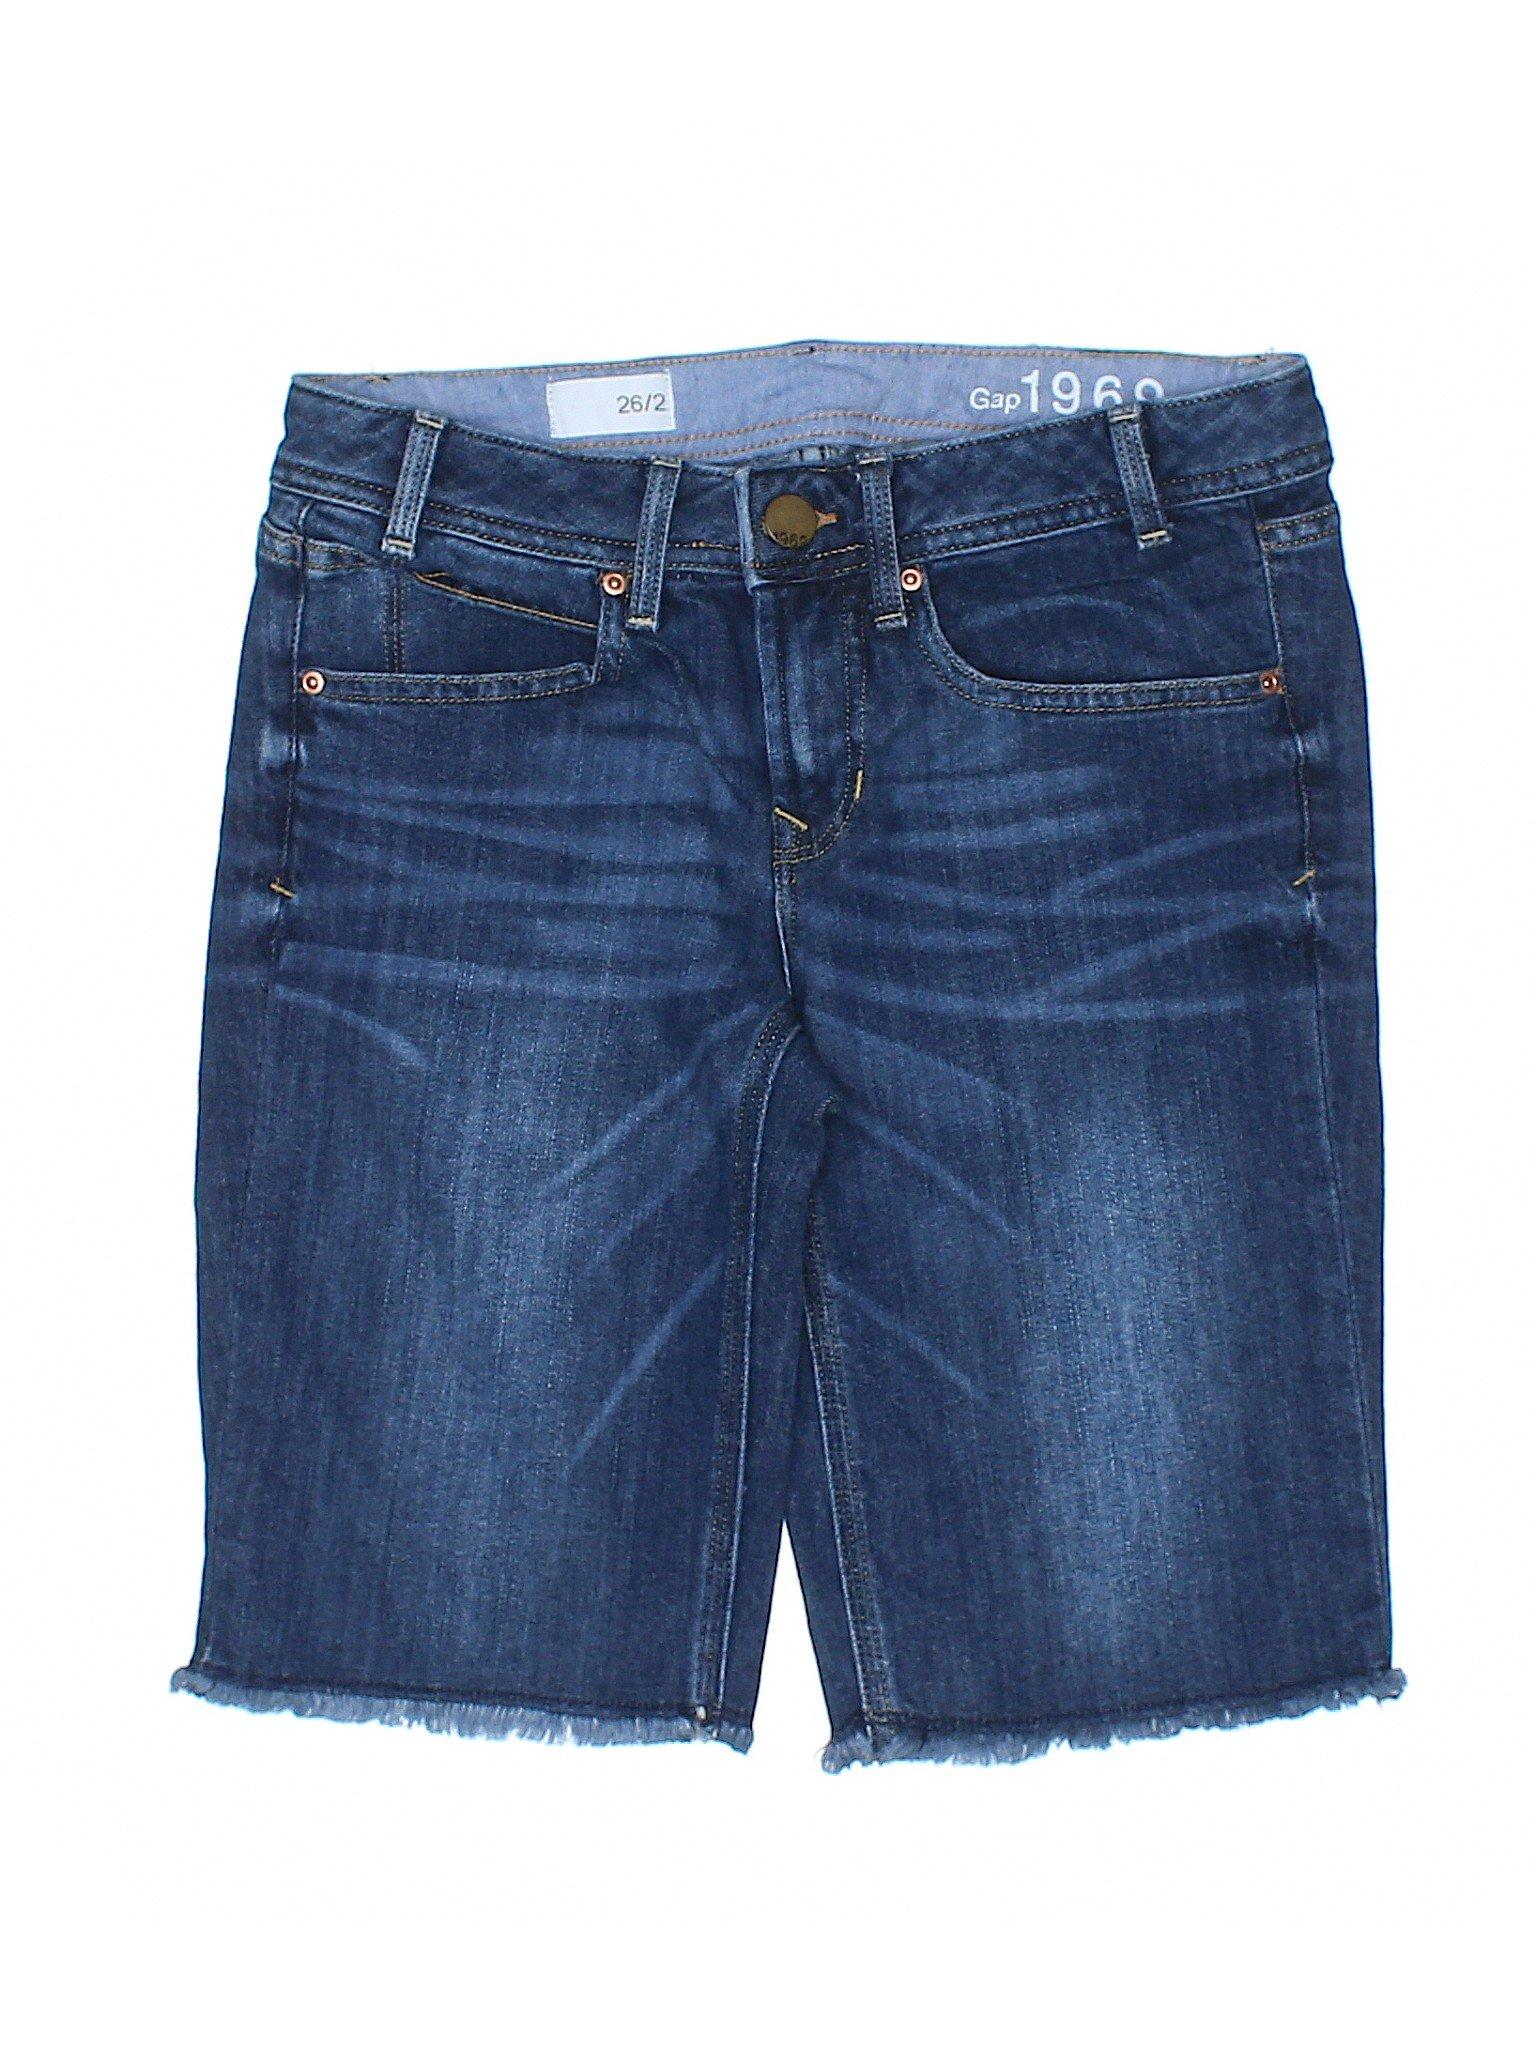 Shorts Gap Denim Denim Boutique Shorts Boutique Gap Gap Boutique Denim Boutique Shorts Denim Shorts Gap fwq6a1A